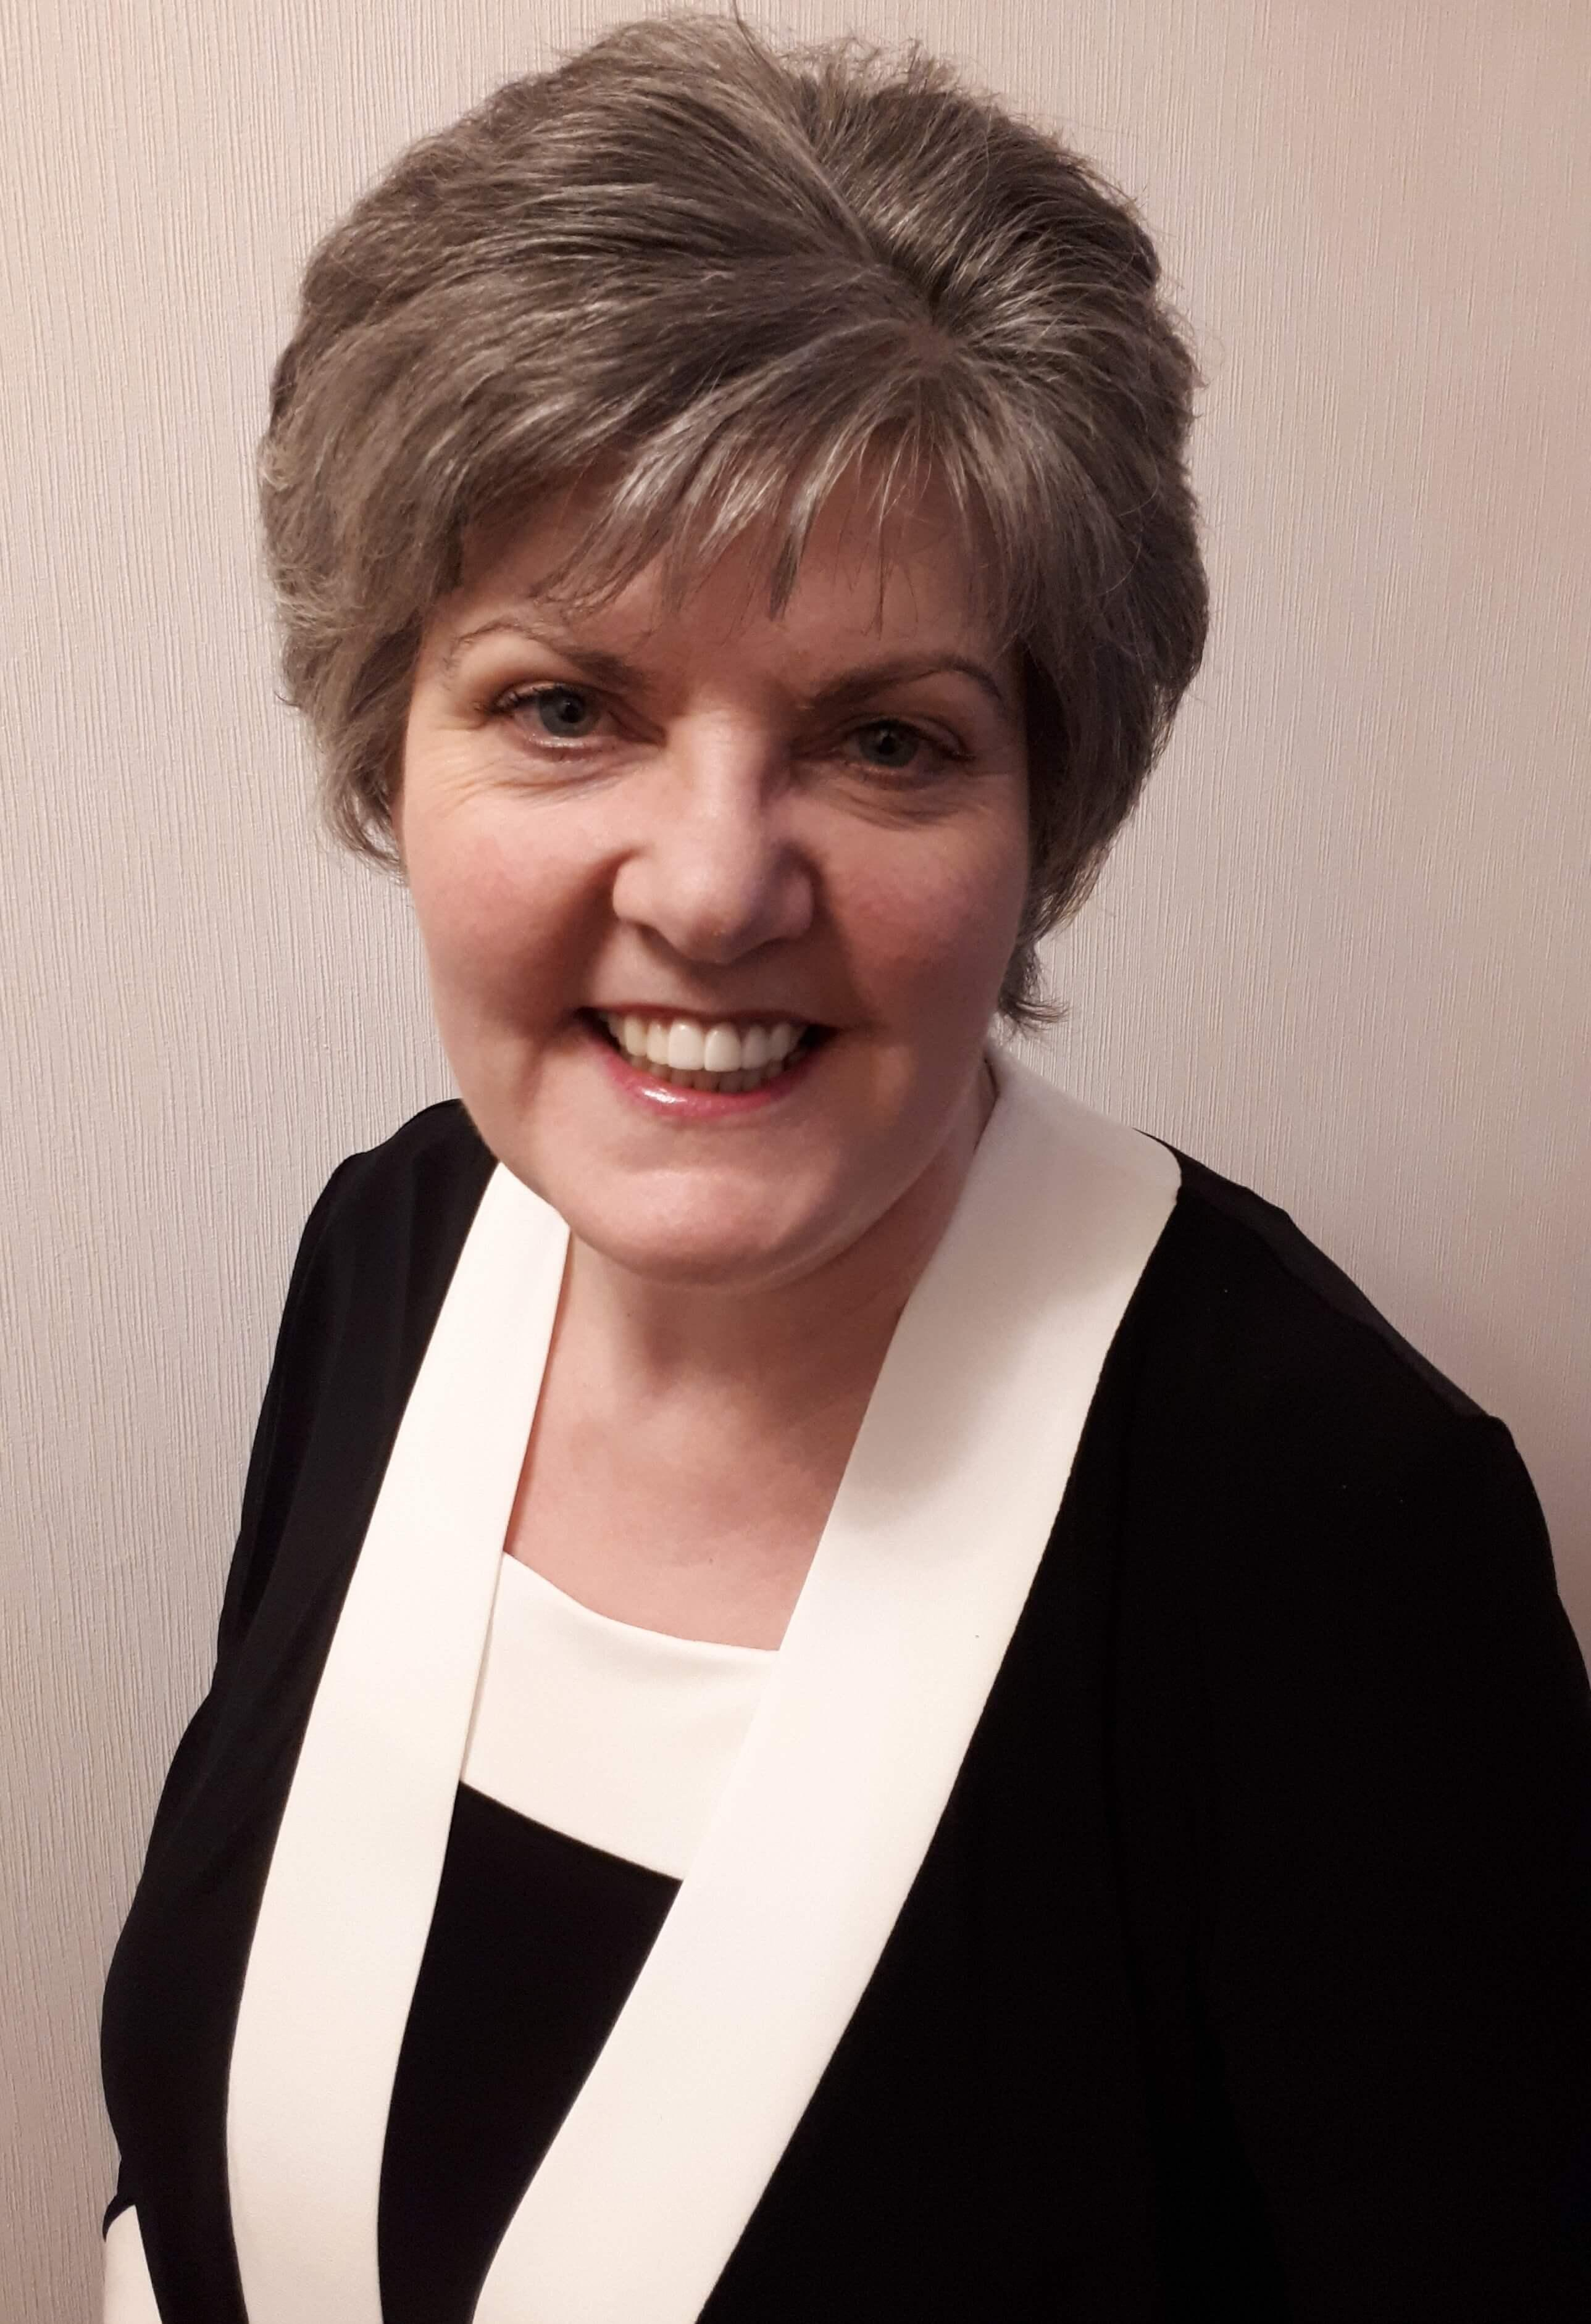 Katherine Watson